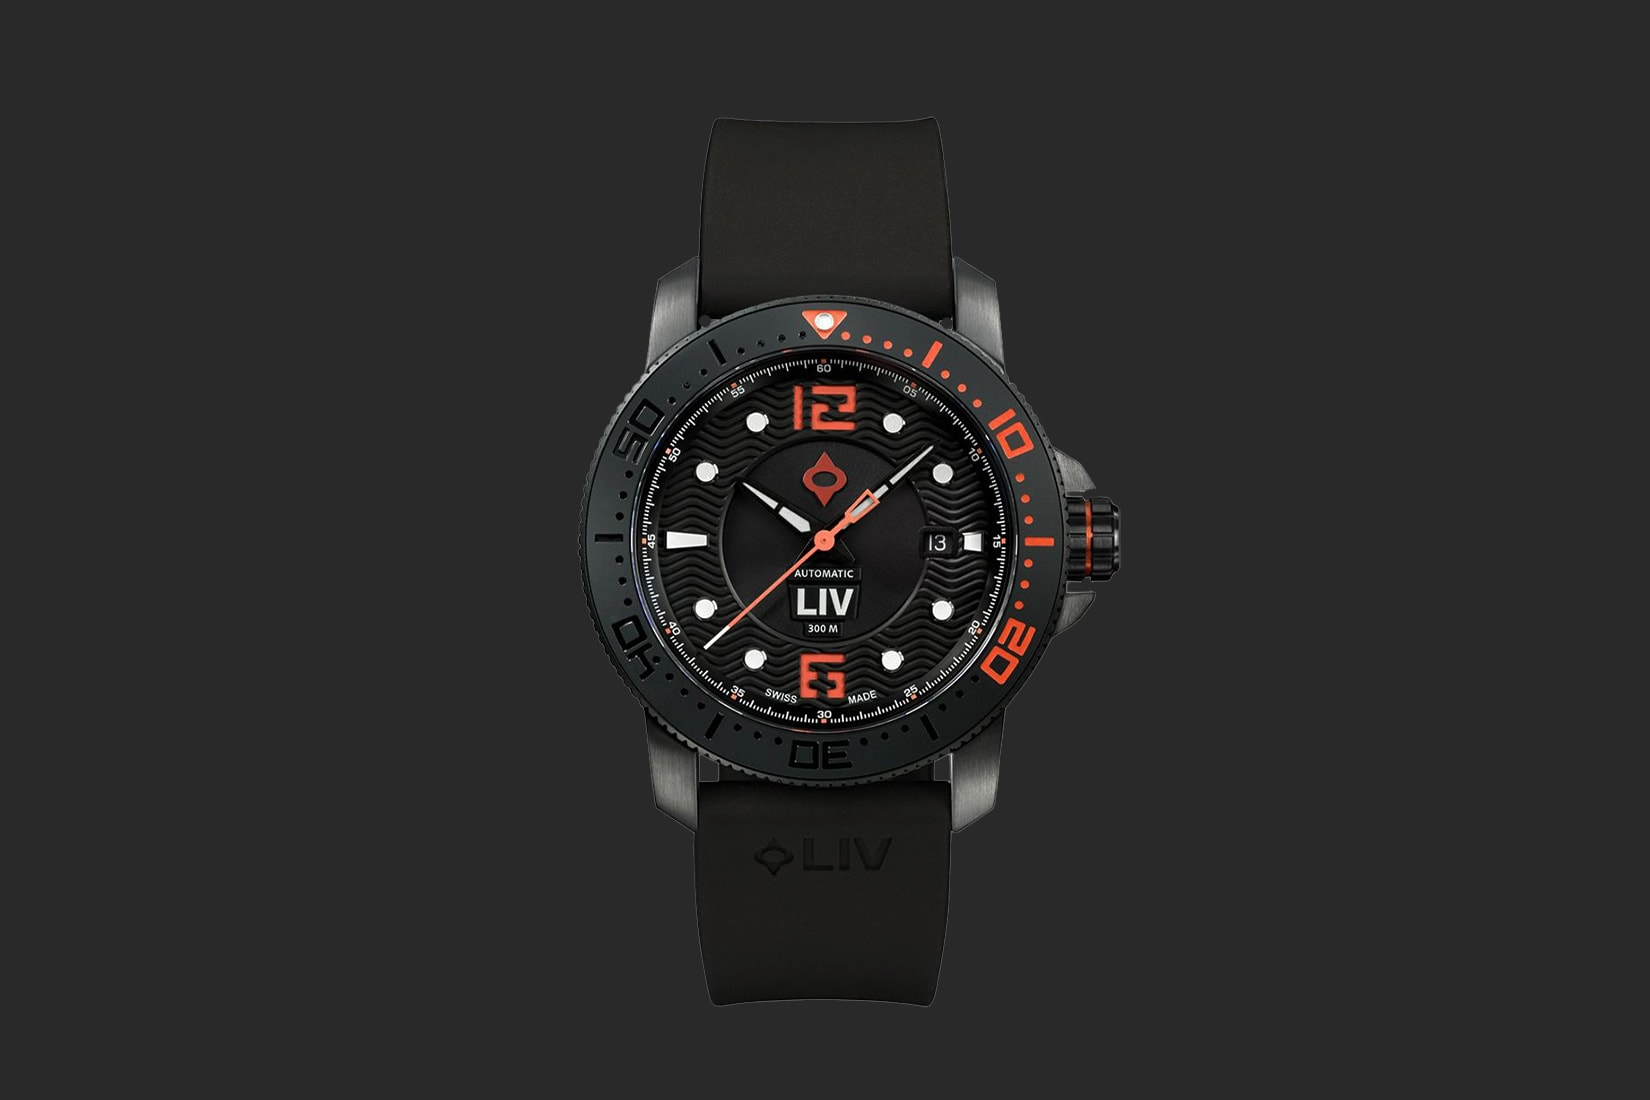 best dive watch liv gx diver review - Luxe Digital